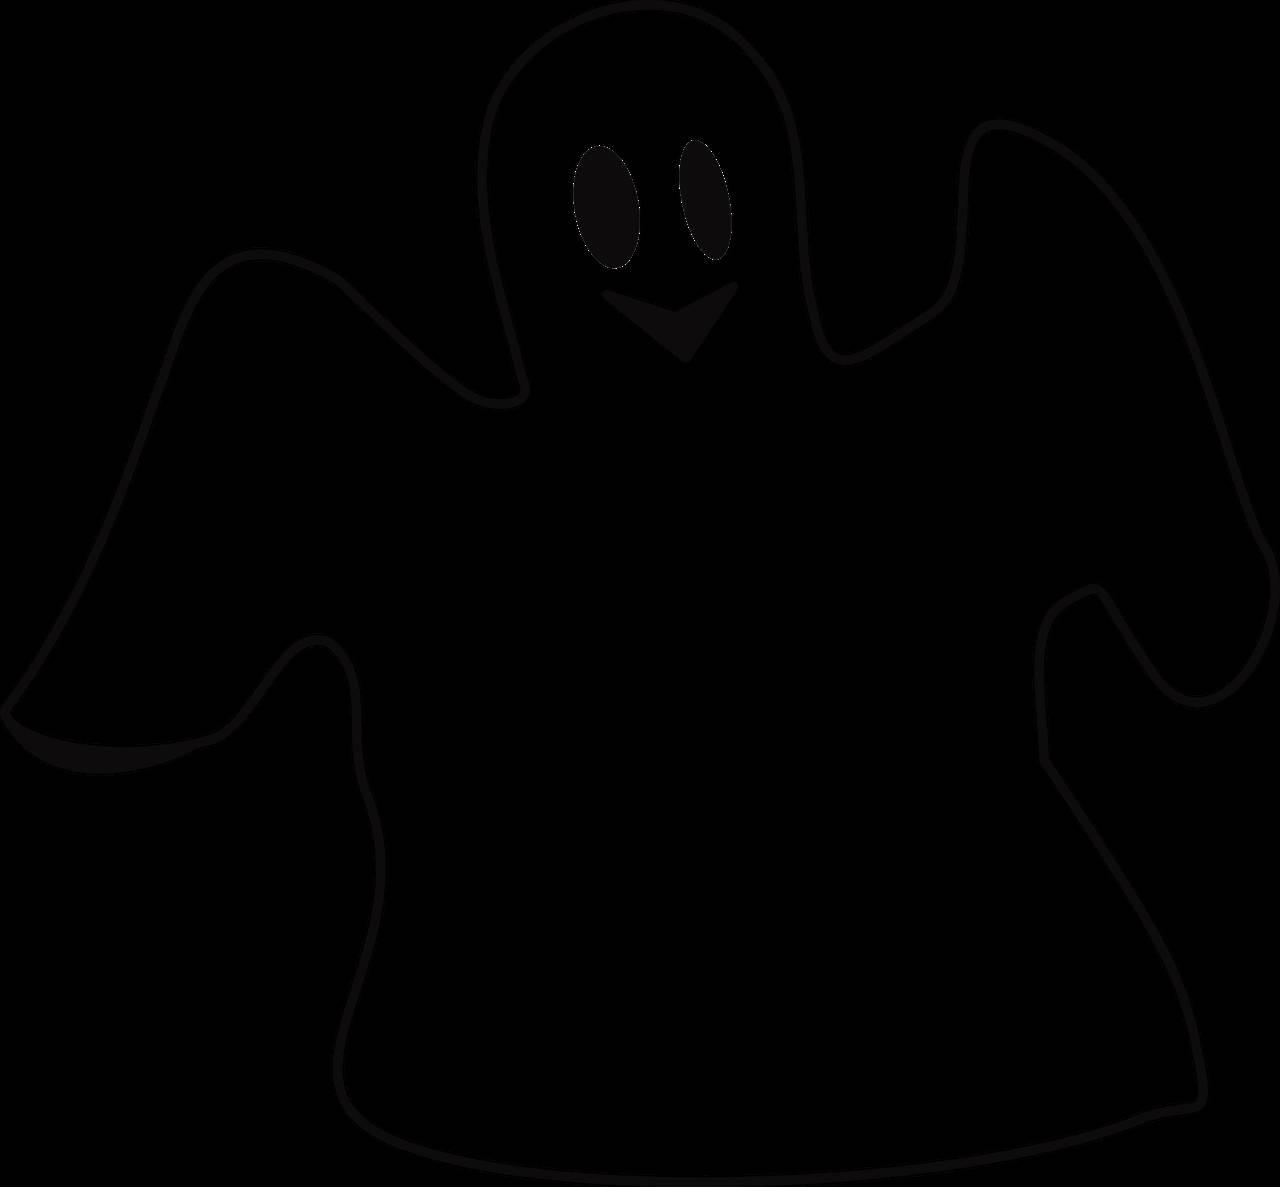 Halloween Ausmalbilder Geister Neu 25 Erstaunlich Ausmalbilder Herbst Kurbis Stock